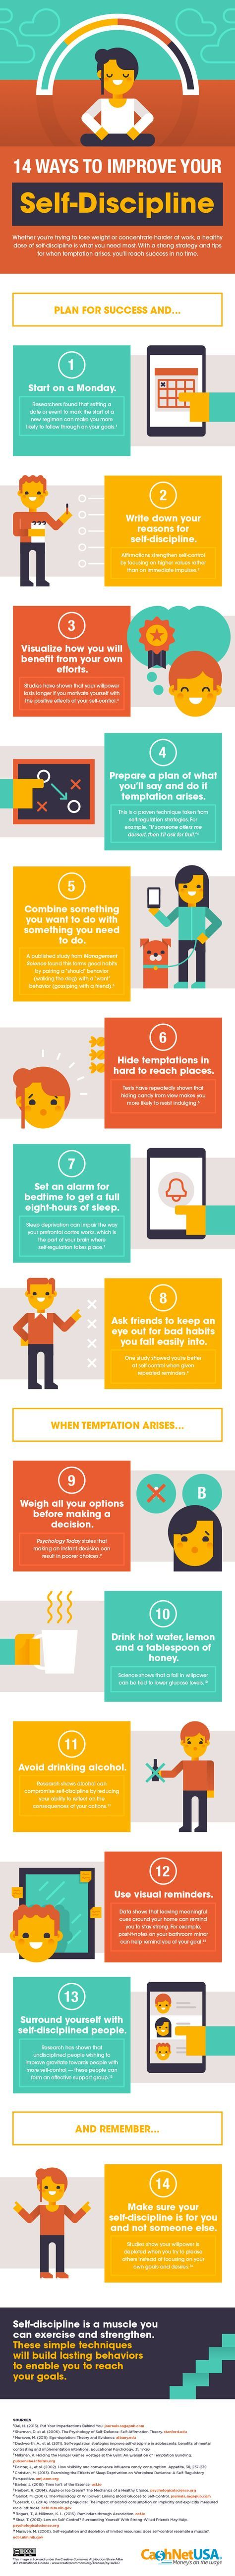 14 Ways to Improve Your Self-Discipline #infographic